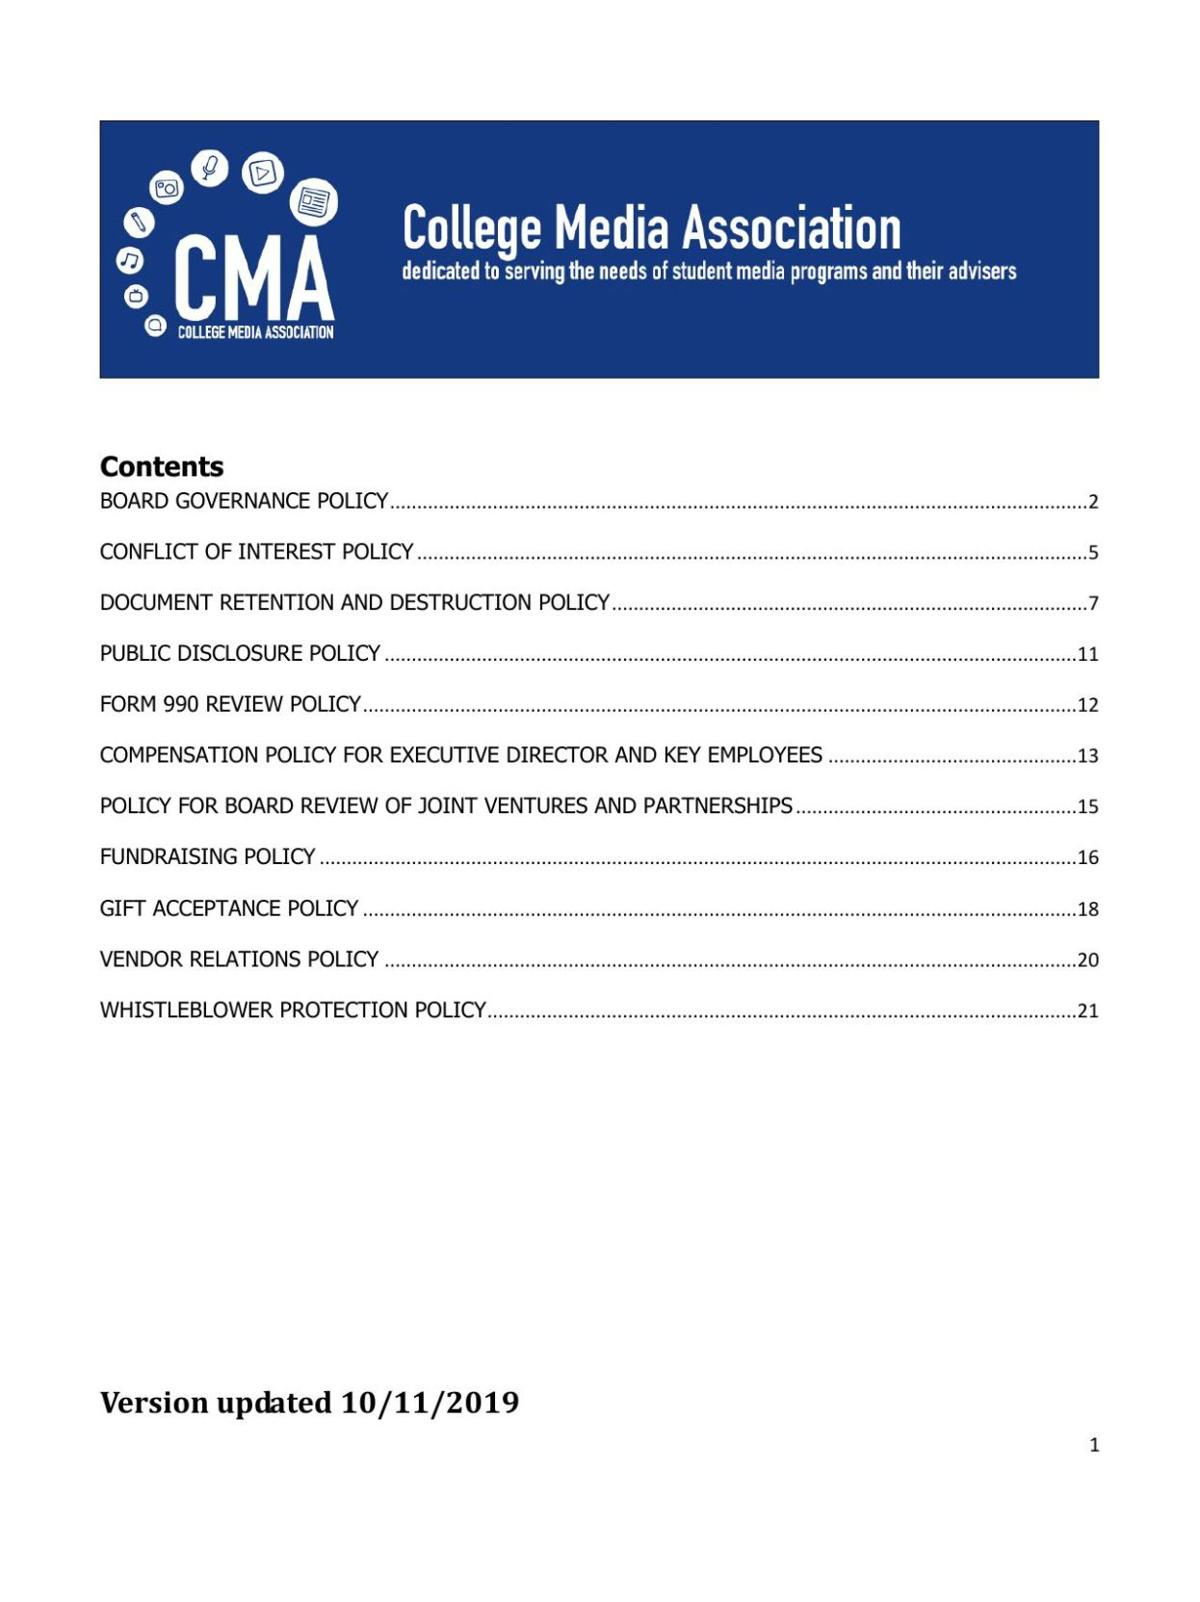 CMA Corporate Policies